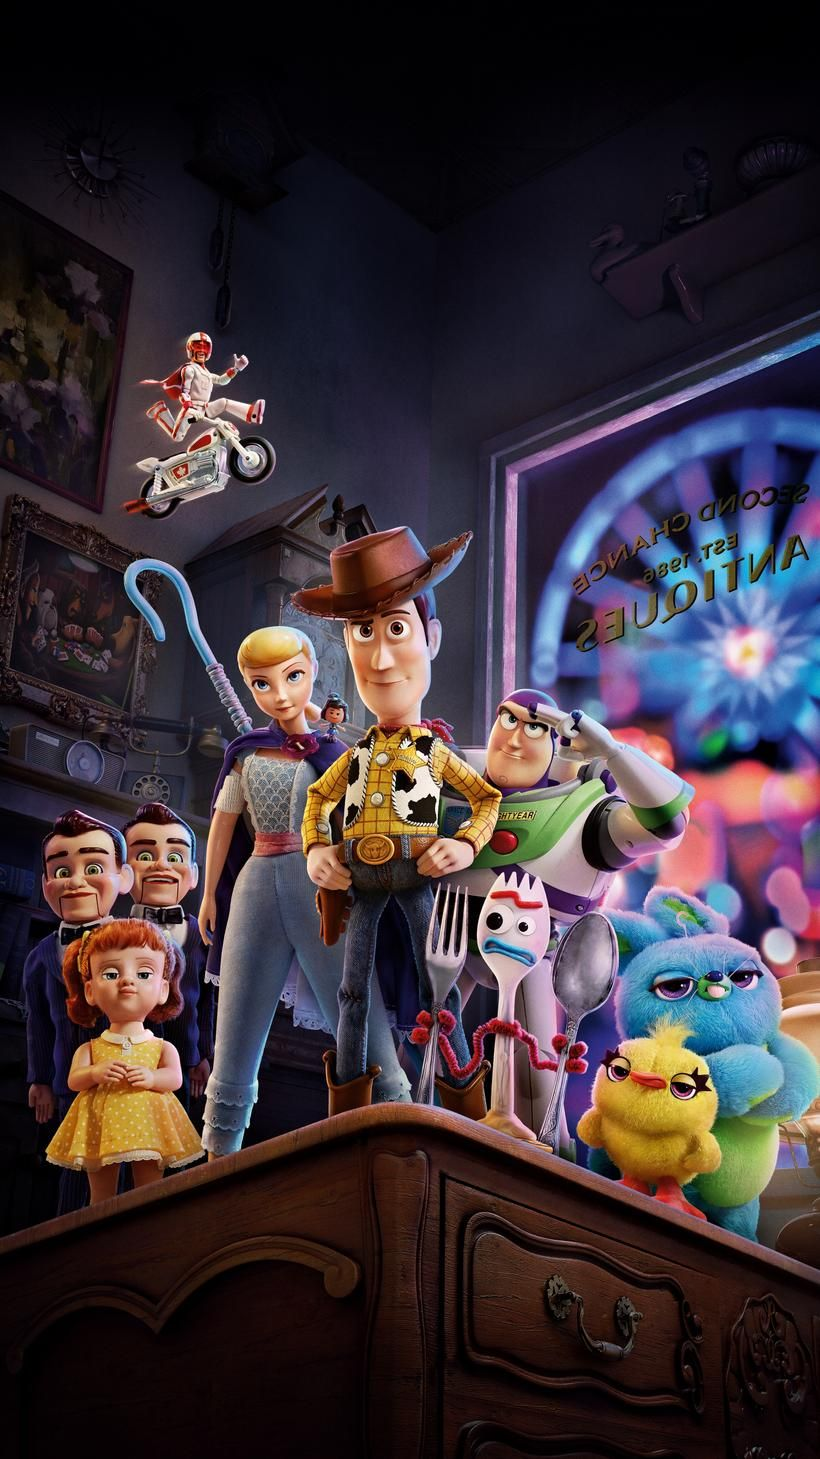 Toy Story 4 (2019) Phone Wallpaper Fondos de pantalla de